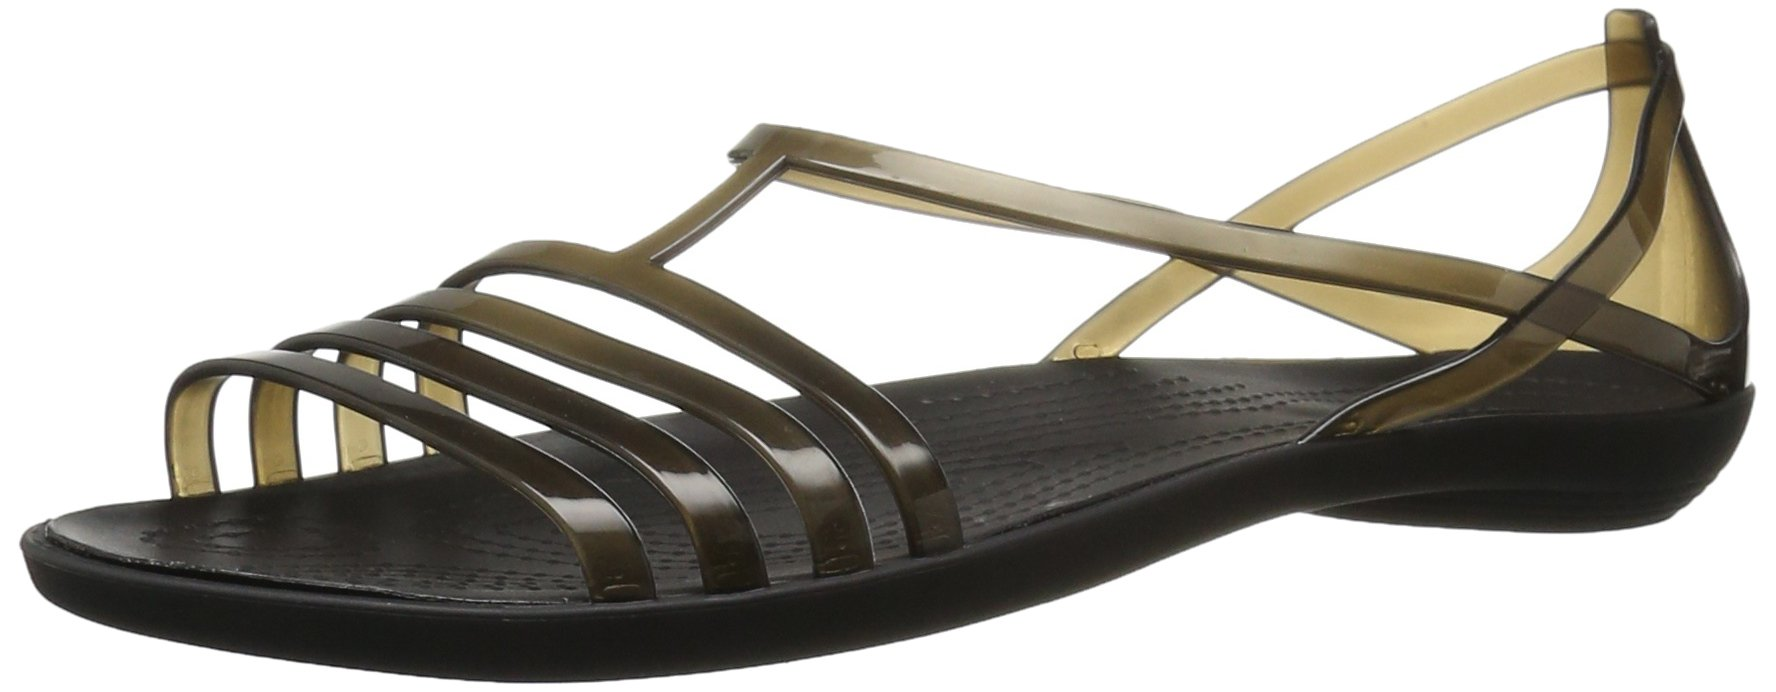 crocs Women's Isabella W Jelly Sandal, Black, 8 M US by Crocs